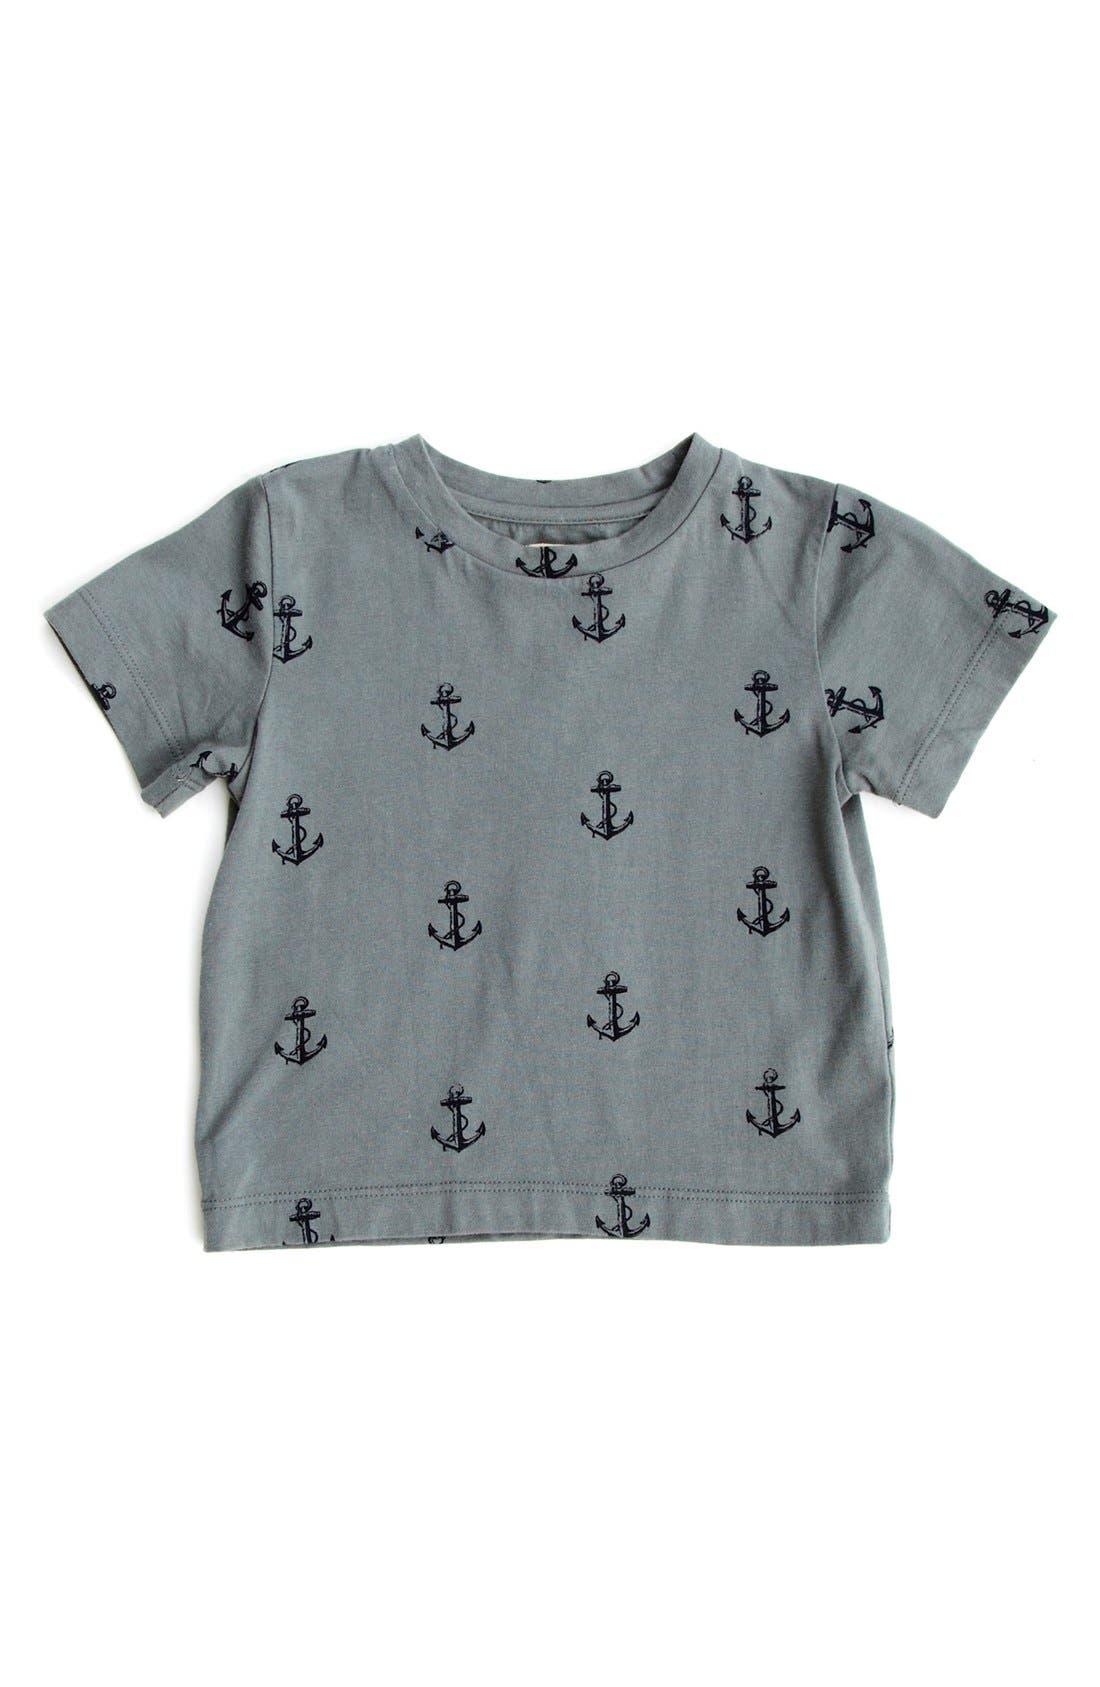 Main Image - Peek 'Allover Anchor' T-Shirt (Baby Boys)